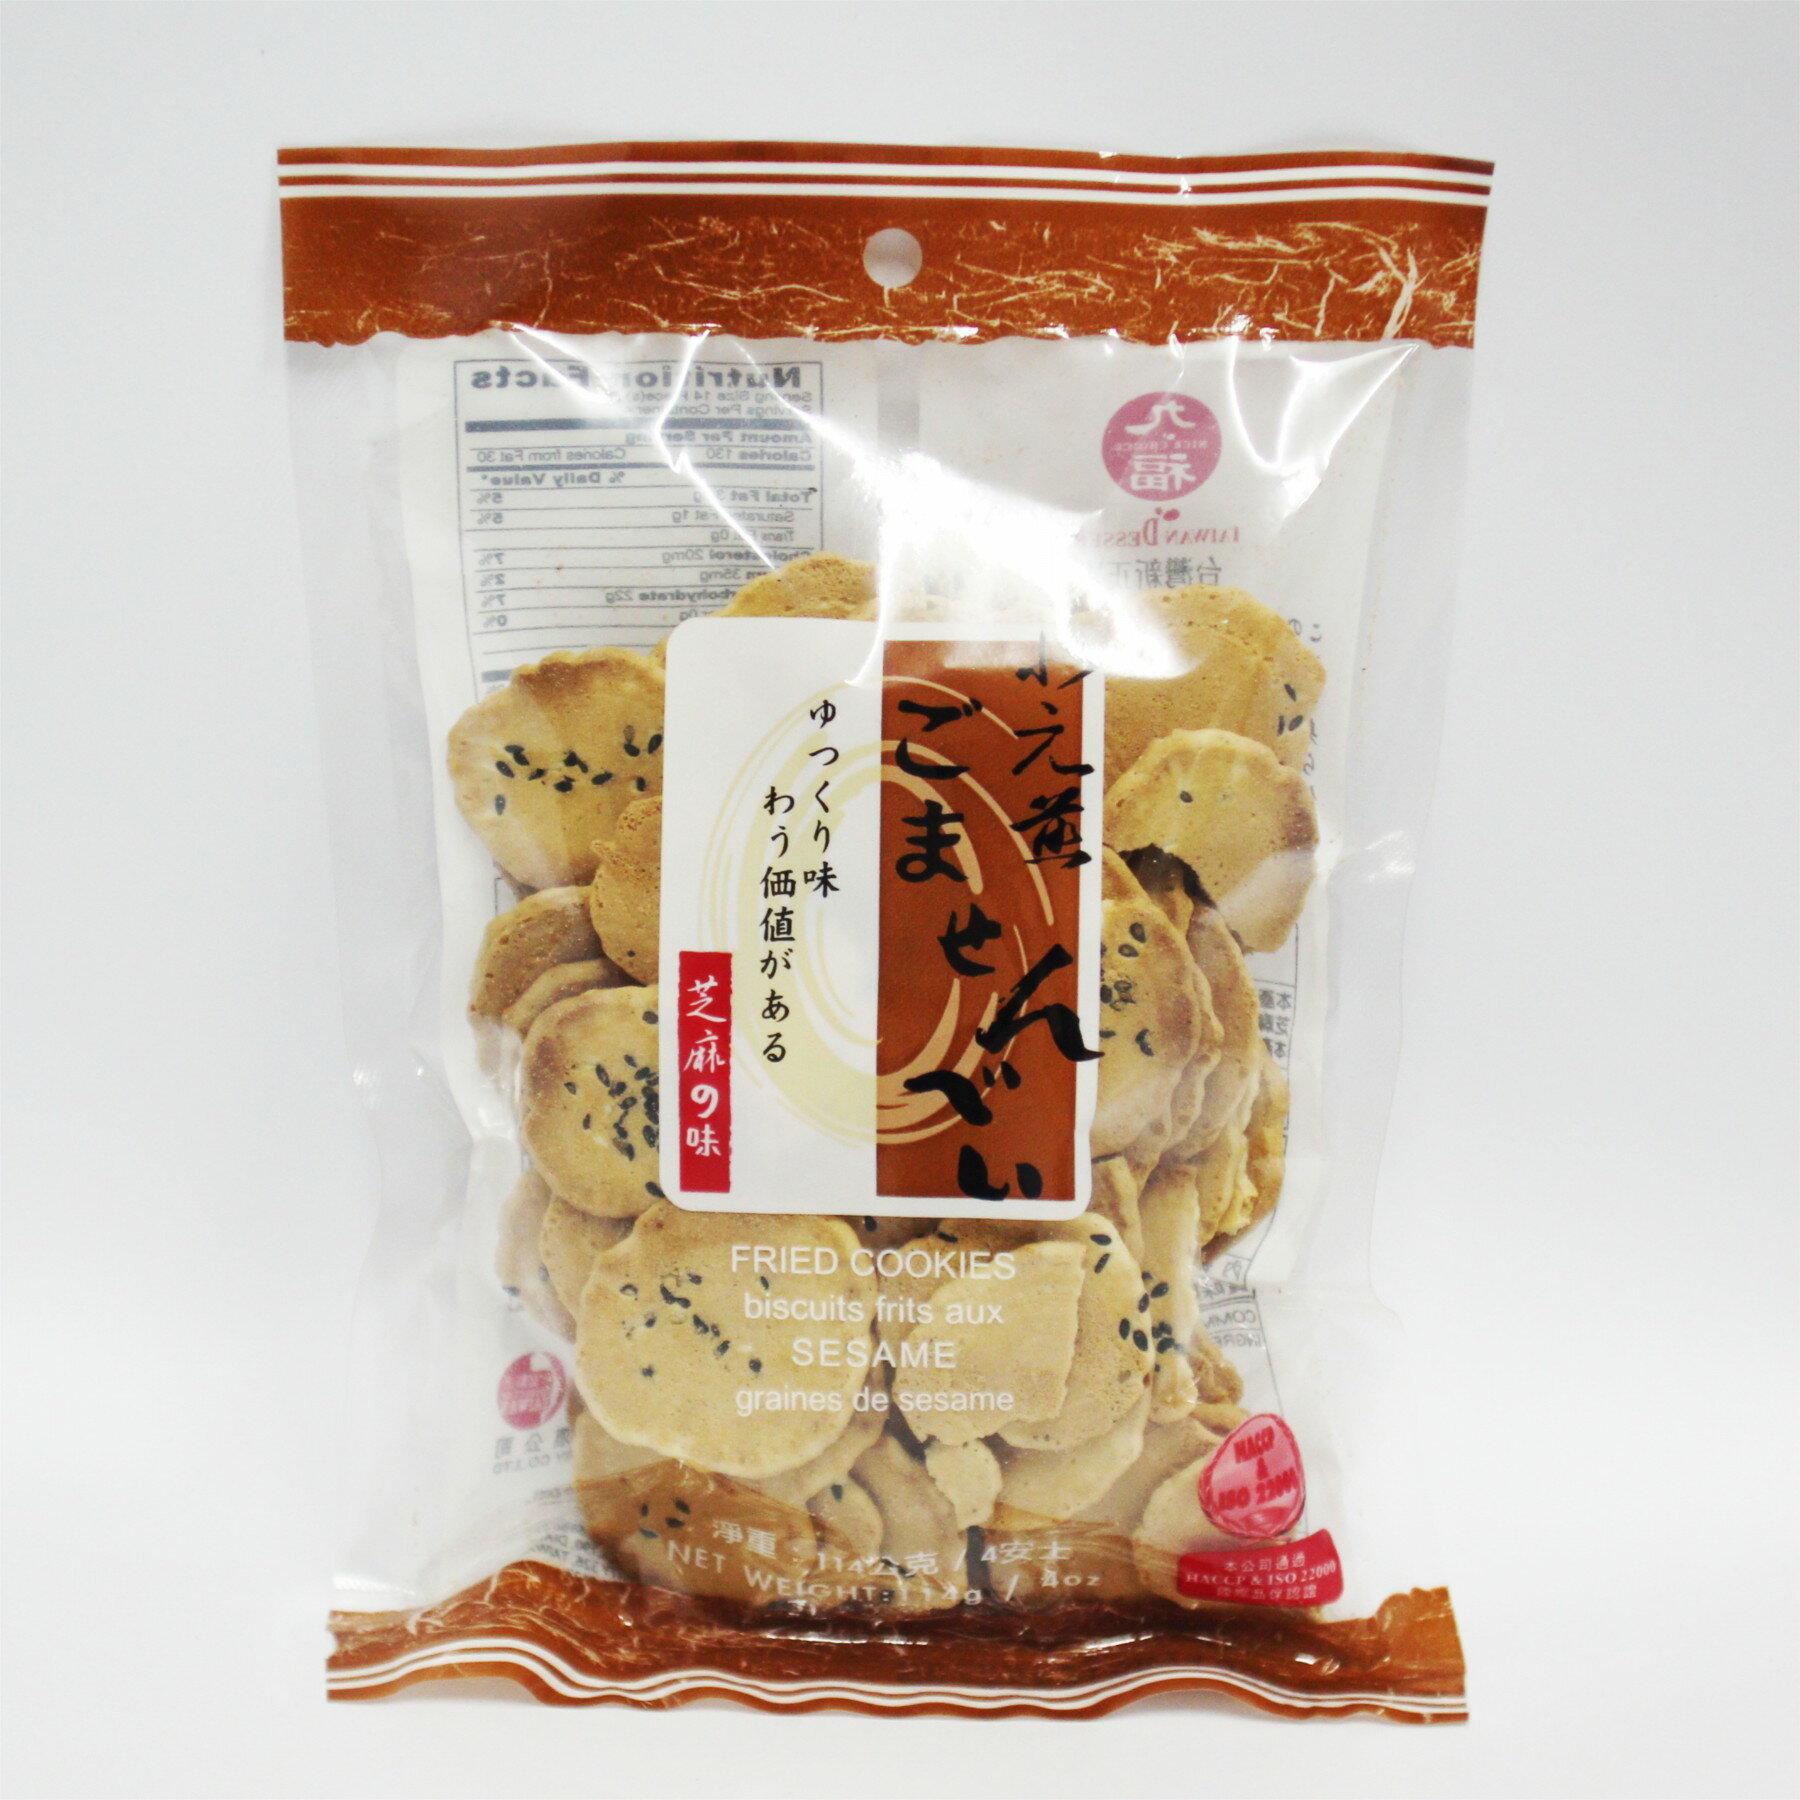 【KTmiss】芝麻煎餅 海苔煎餅 (蛋素)